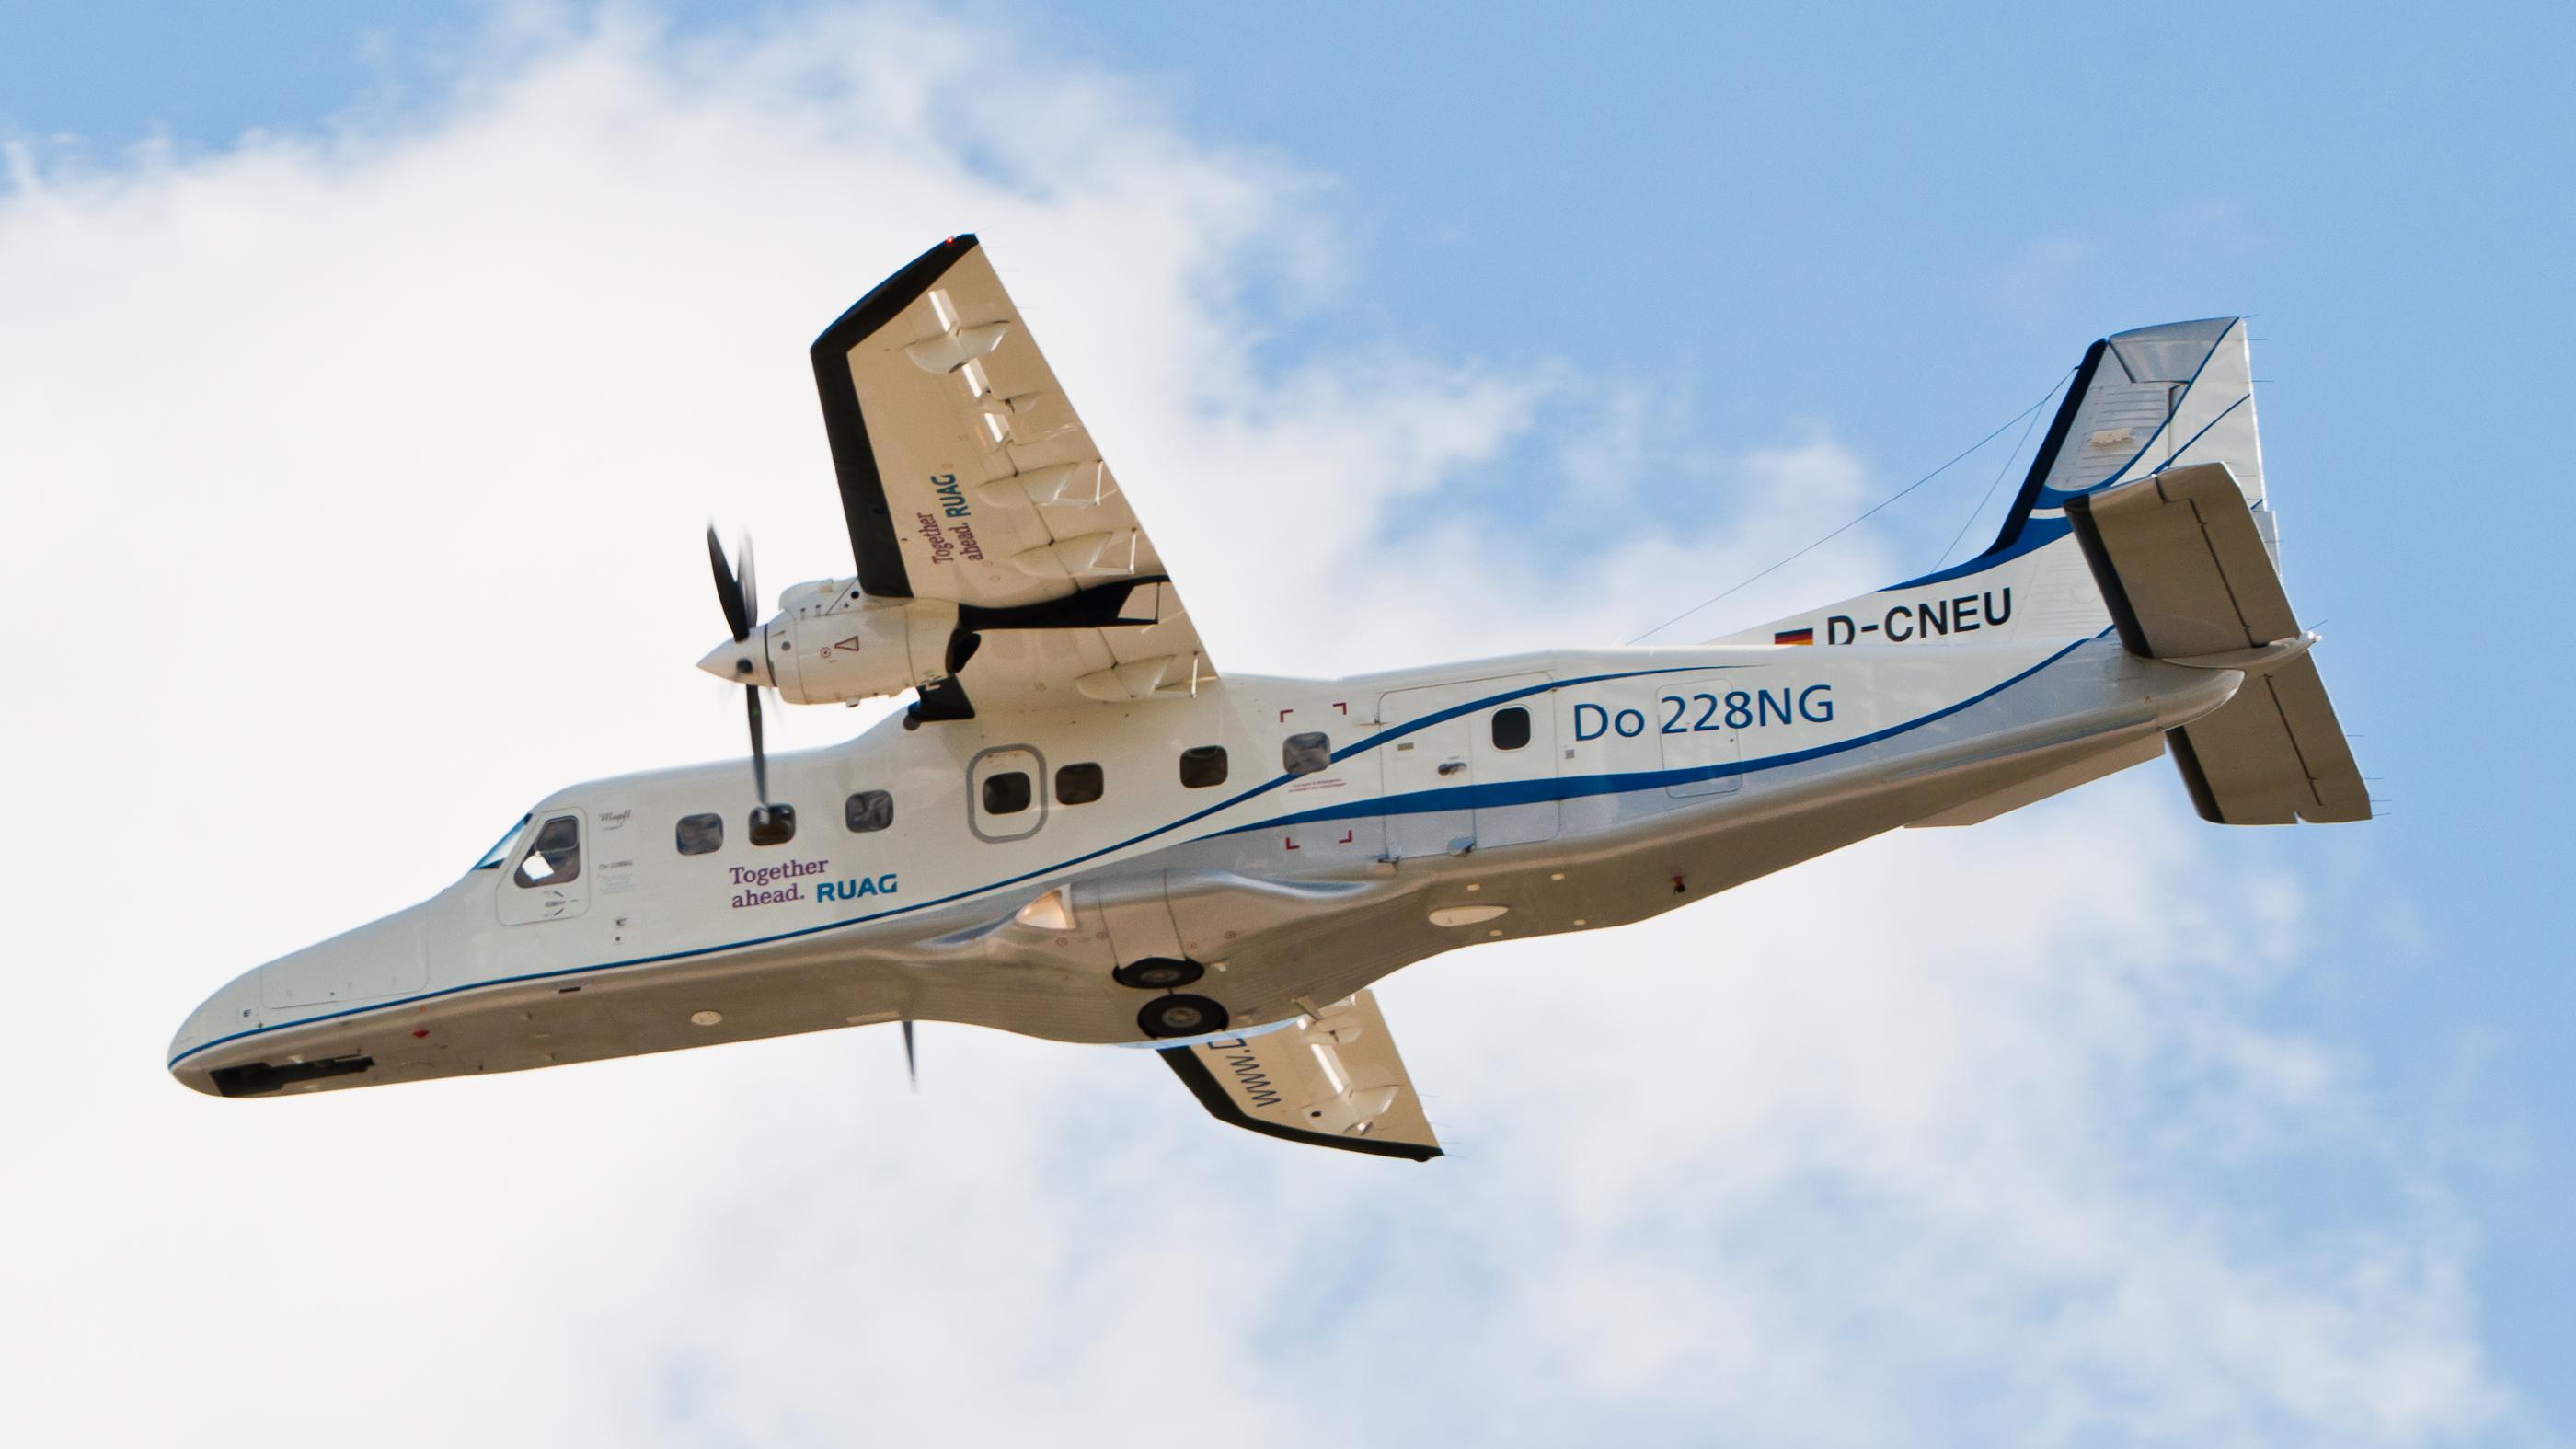 File ruag aviation do 228 ng d cneu 3 jpg wikimedia commons